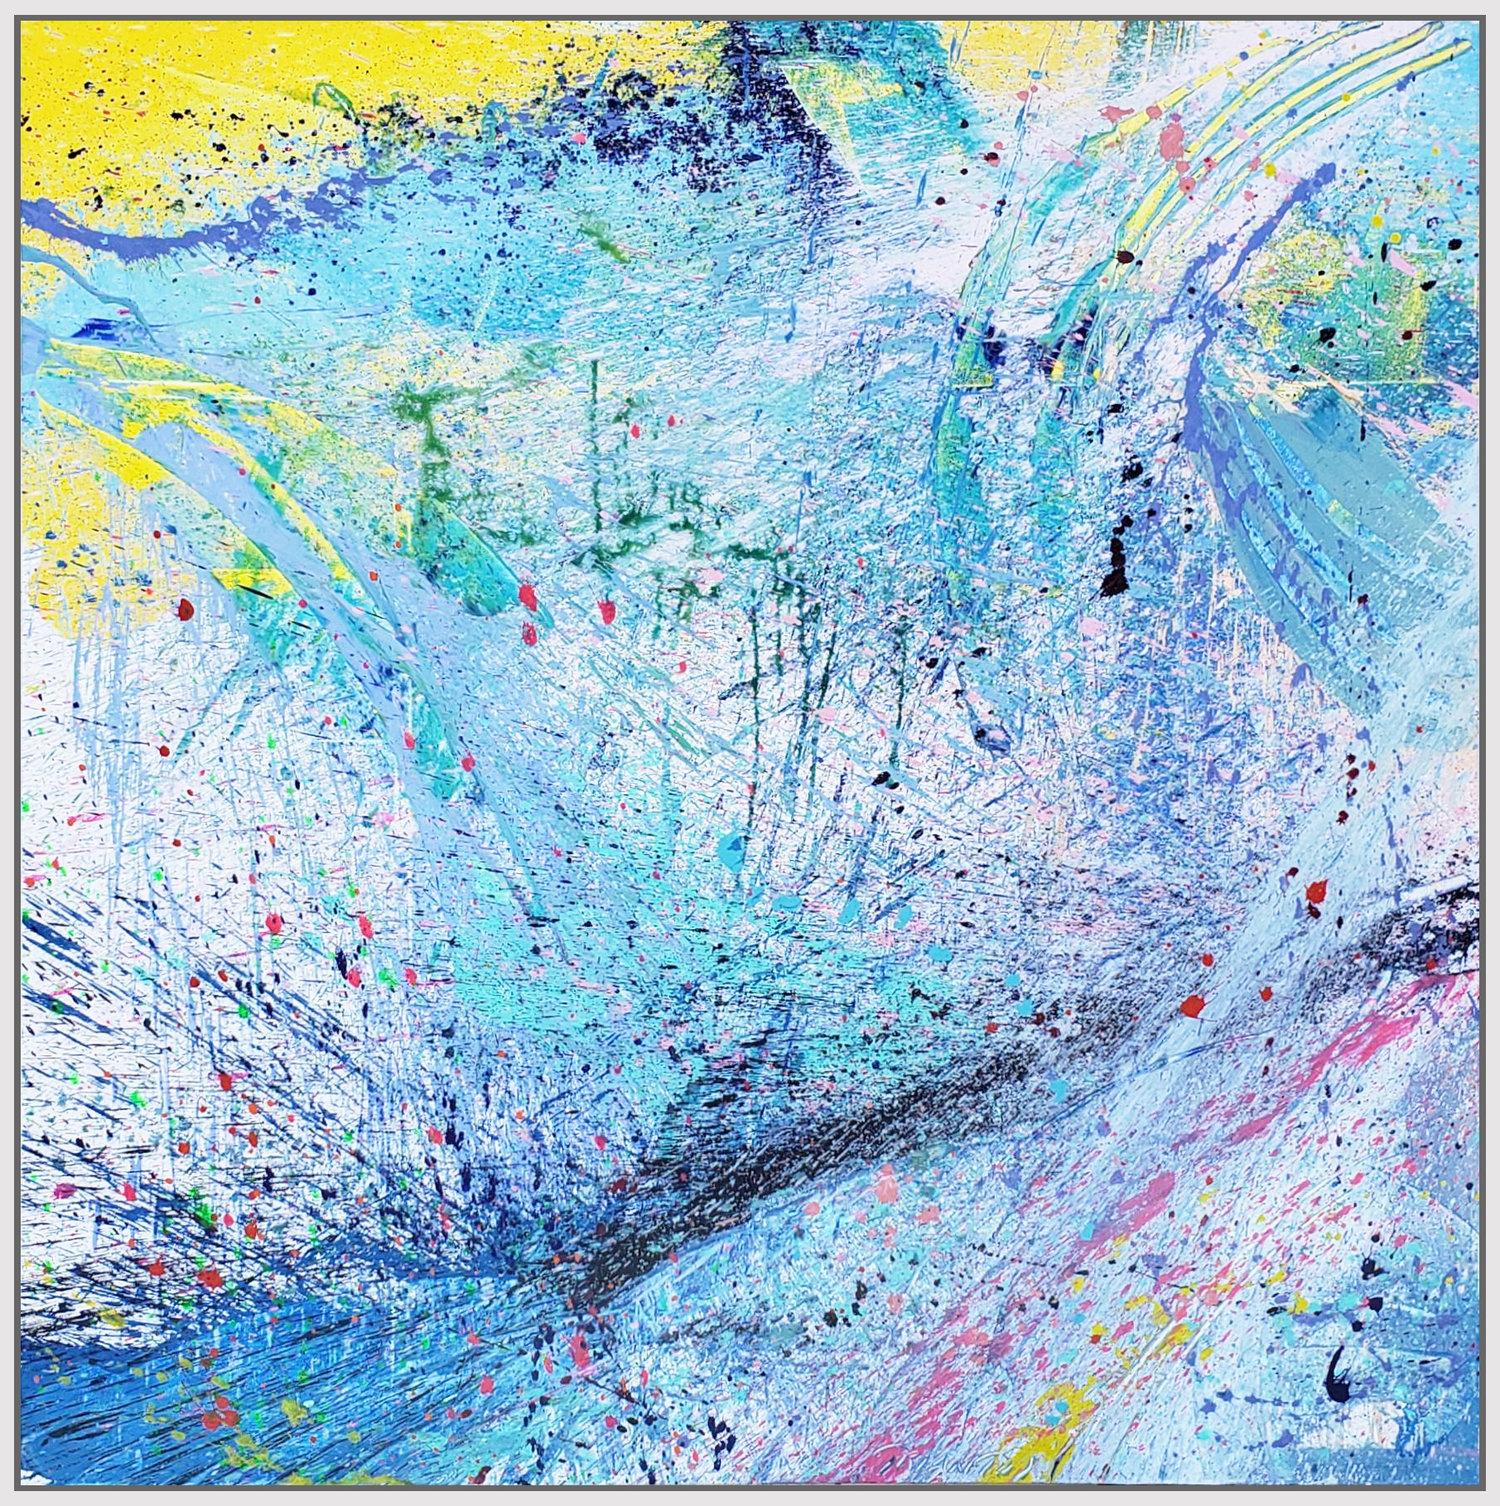 "Napa Valley #100, 2019, acrylic on canvas, 72"" x 72"" (183 x 183 cm)"